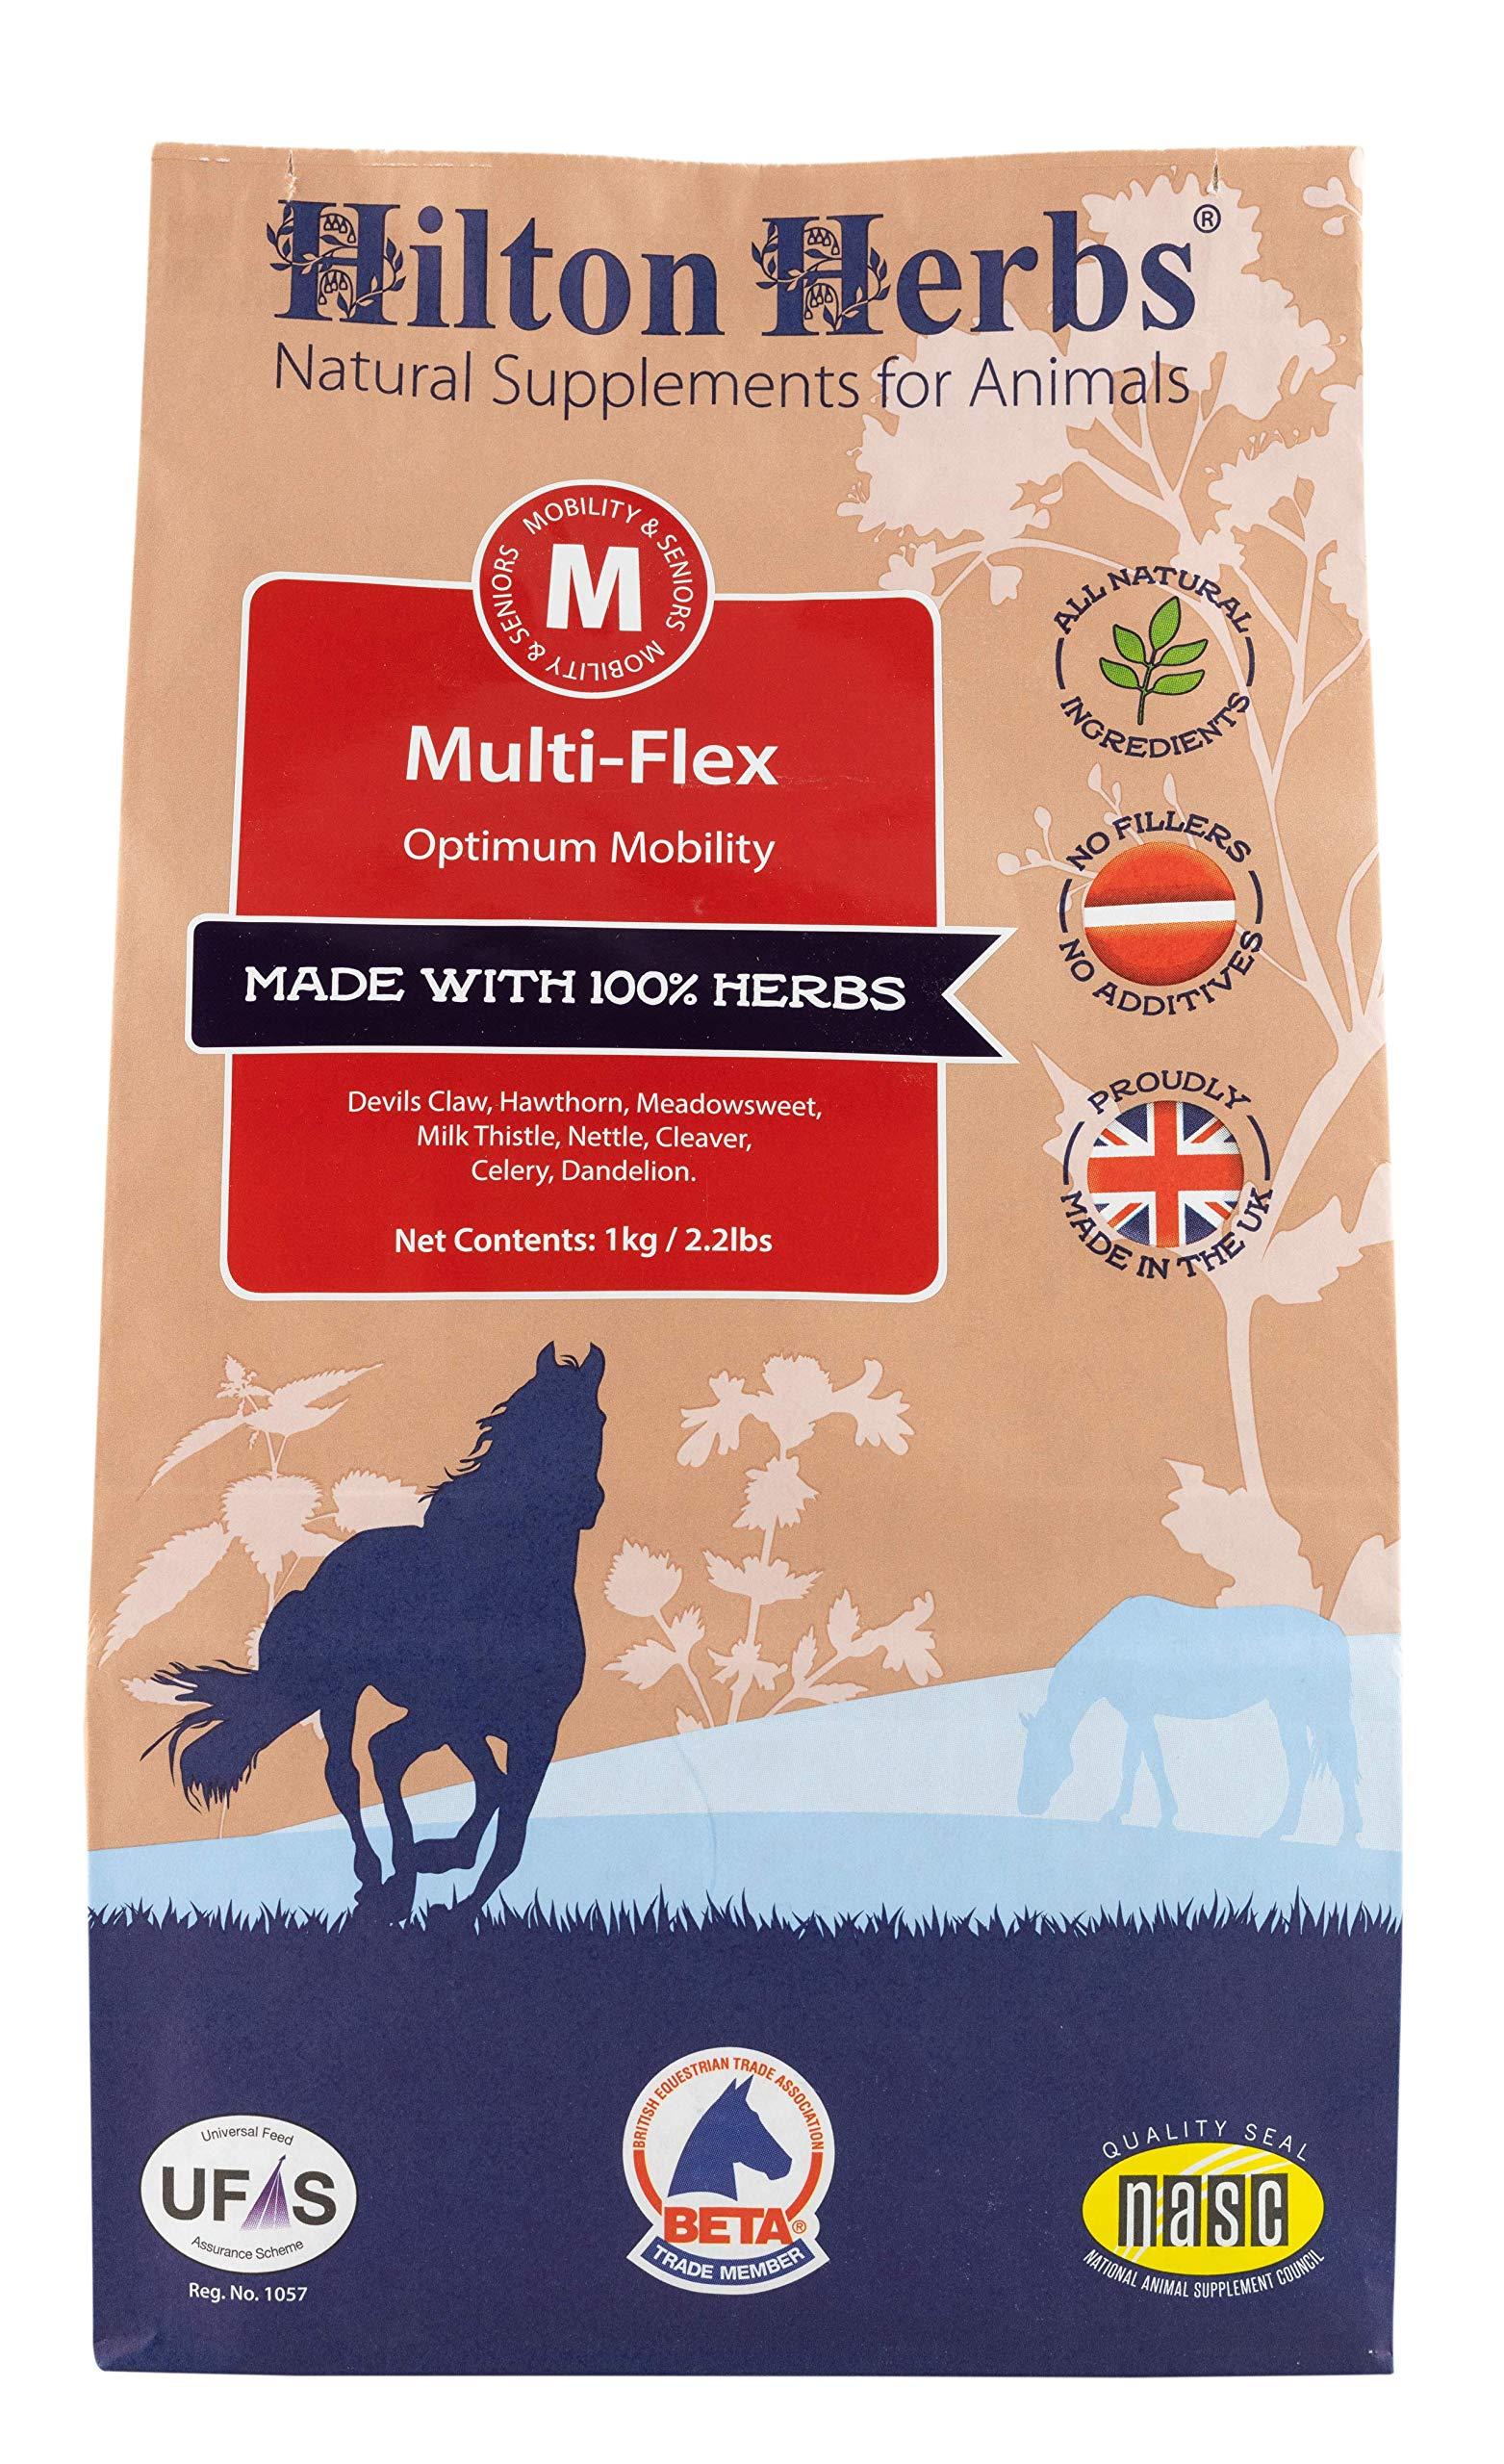 Hilton Herbs Multi-Flex: for Optimum Mobility, 2.2lb Bag